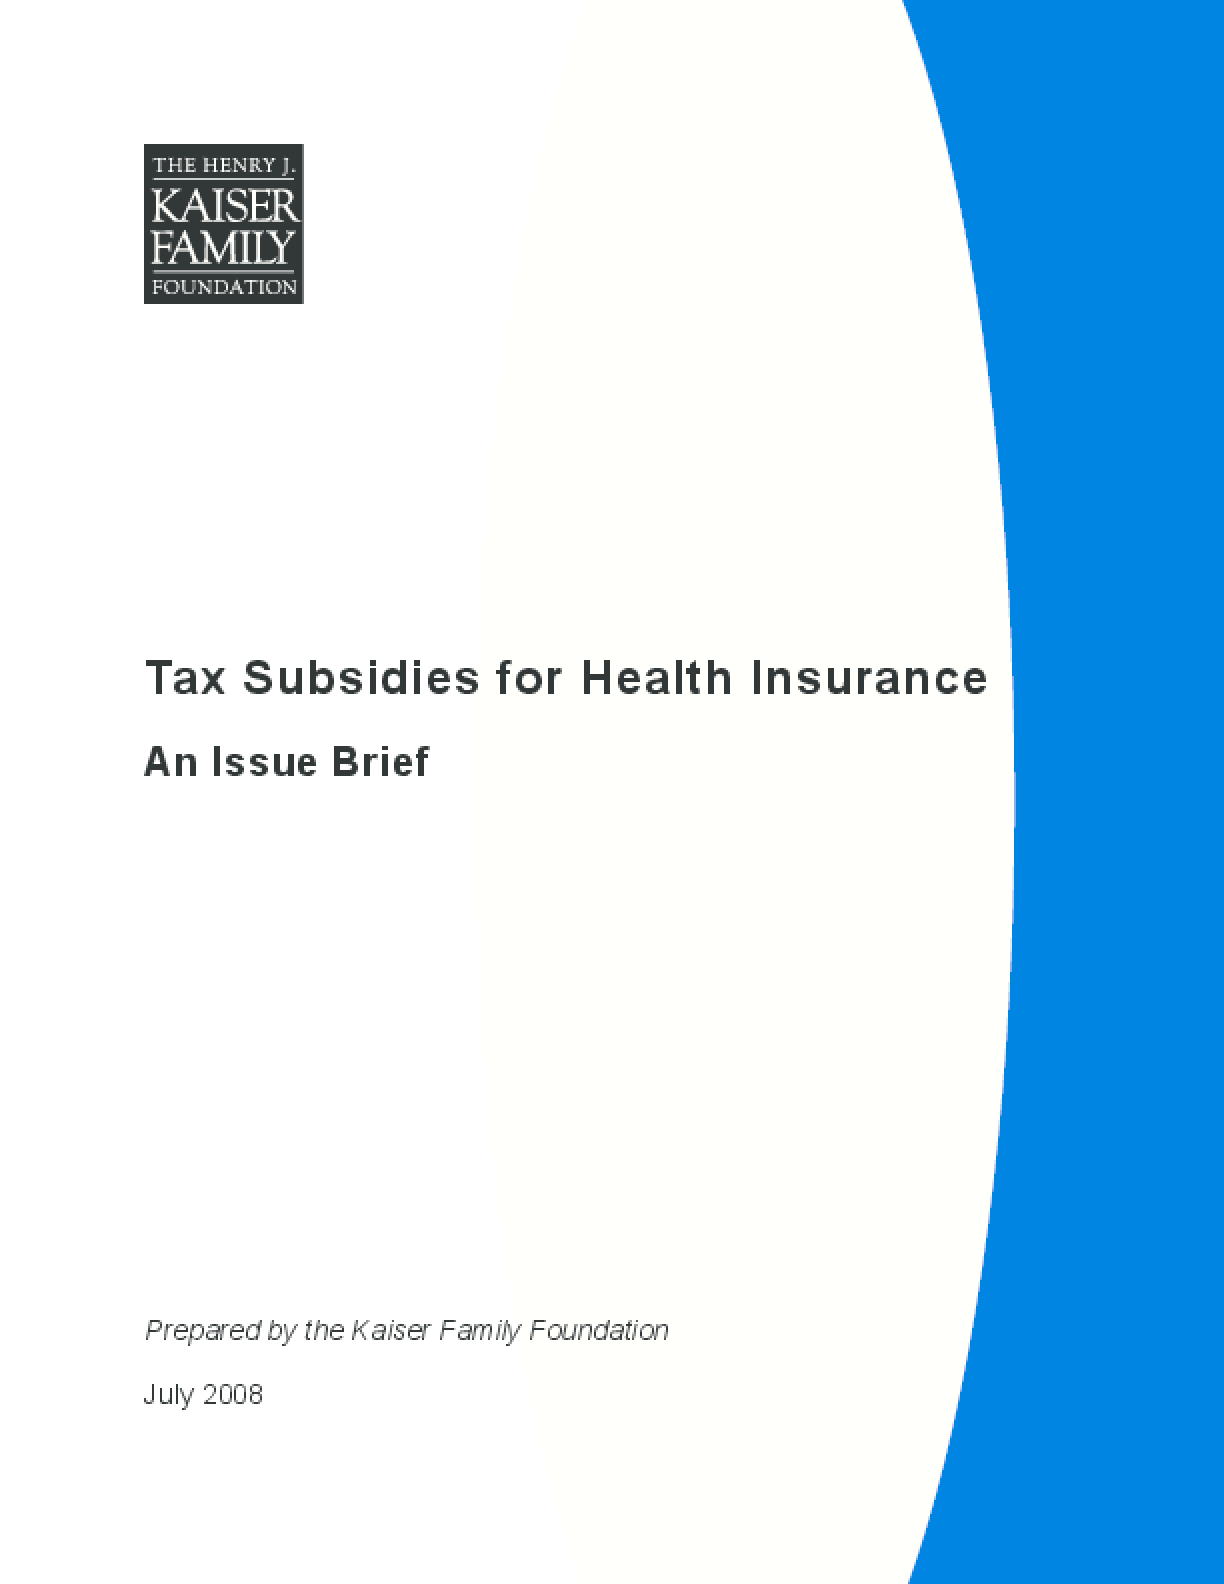 Tax Subsidies for Health Insurance